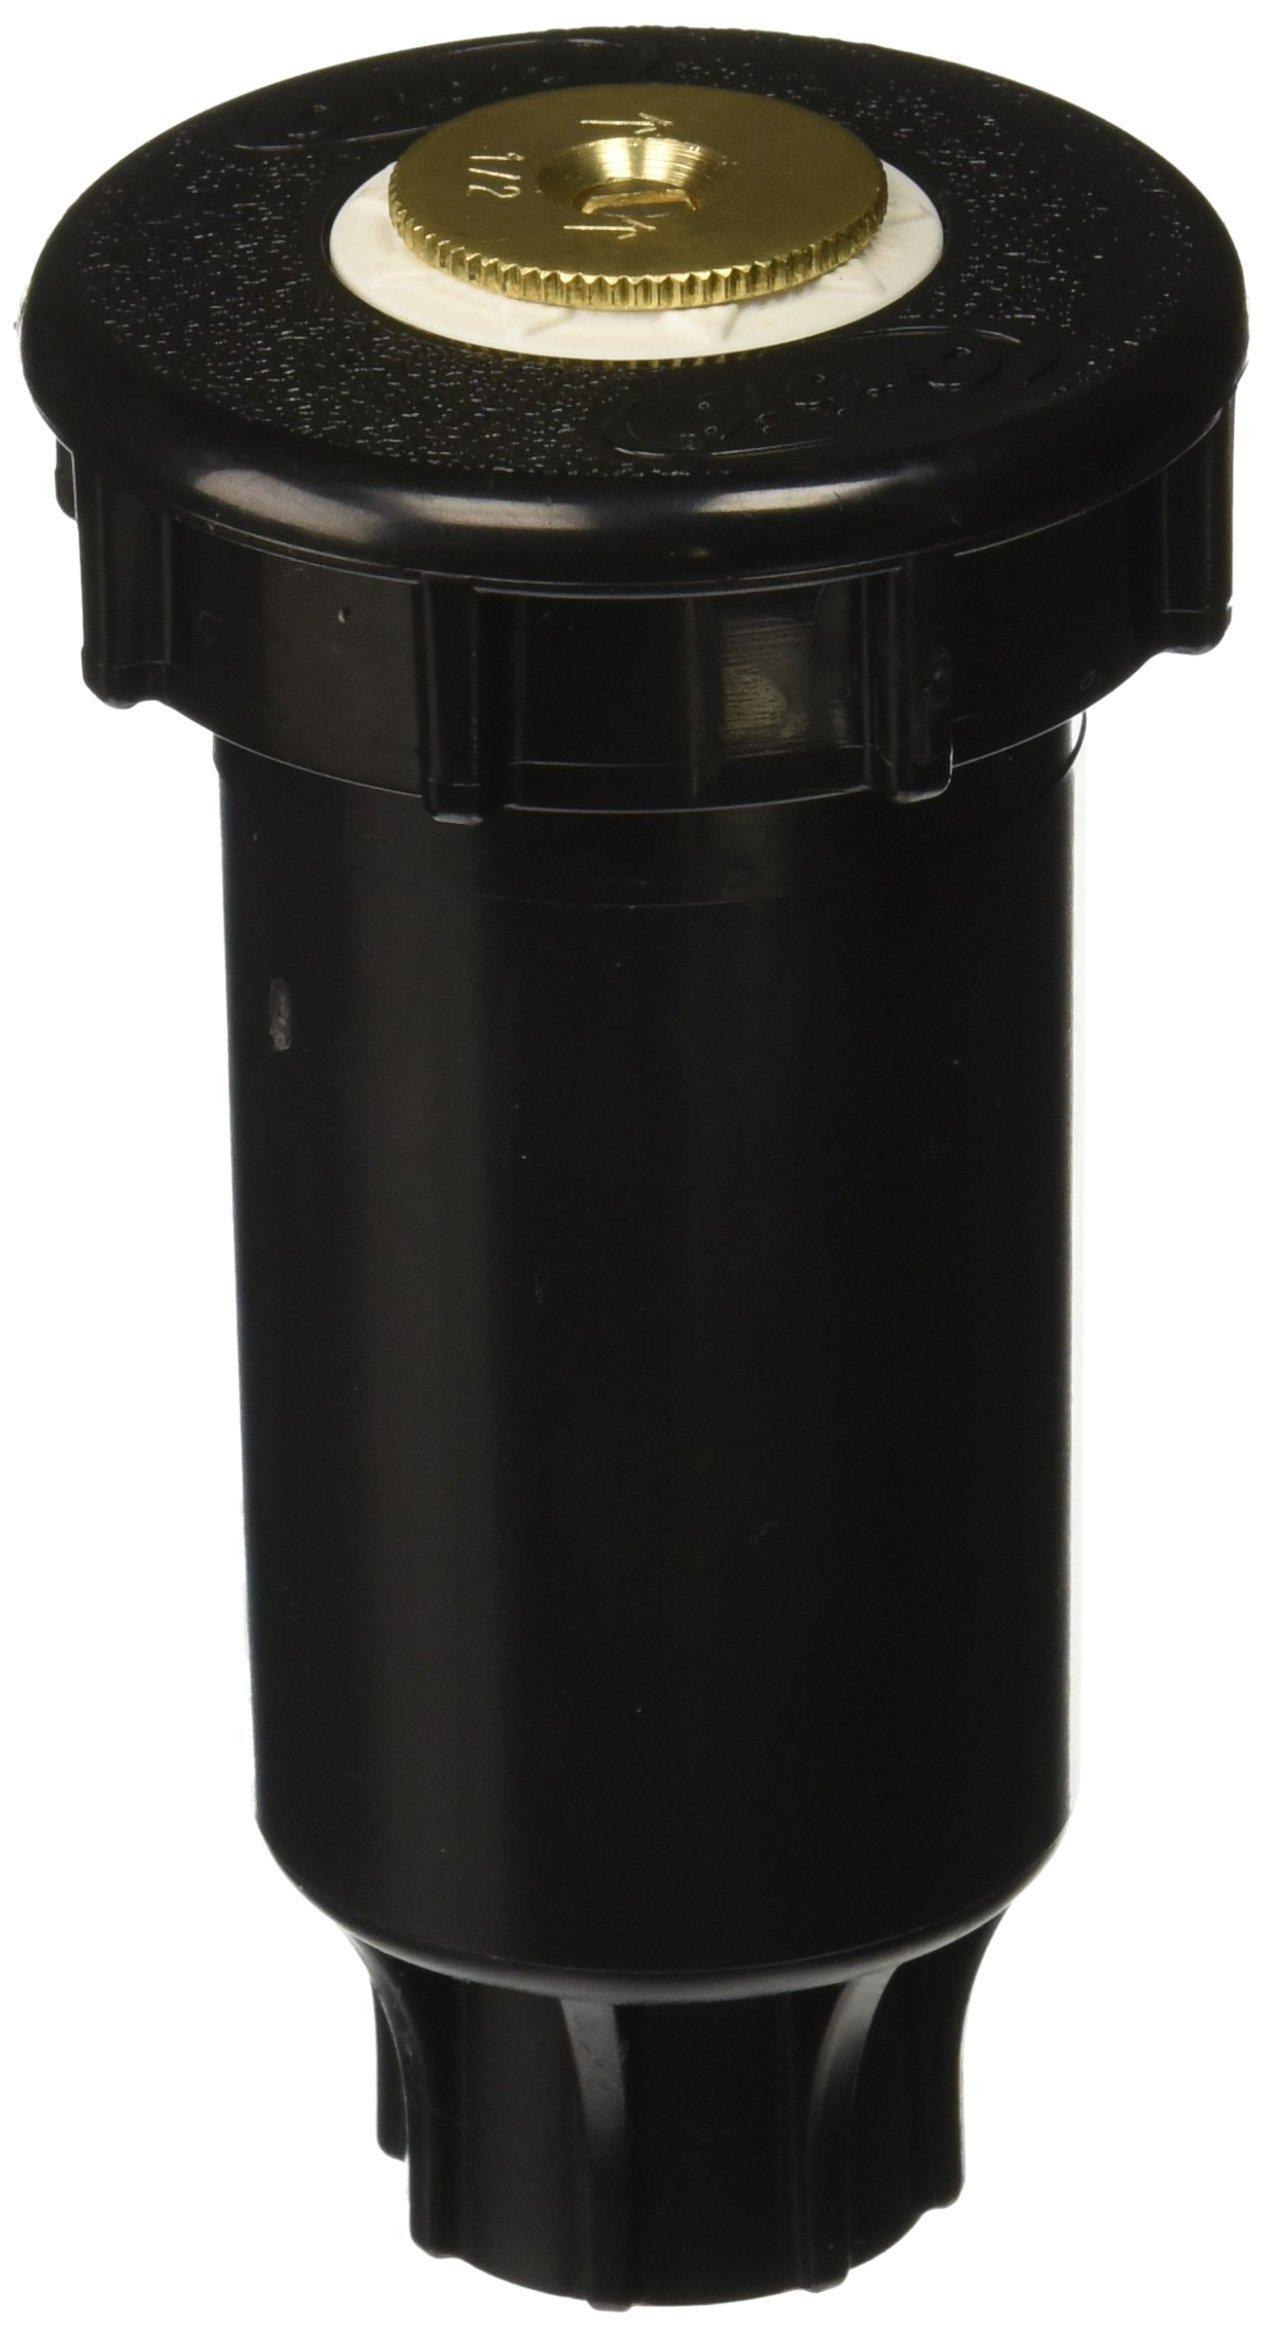 Pack of 1 Orbit 54118 4 Pop-Up Adj Sprinkler